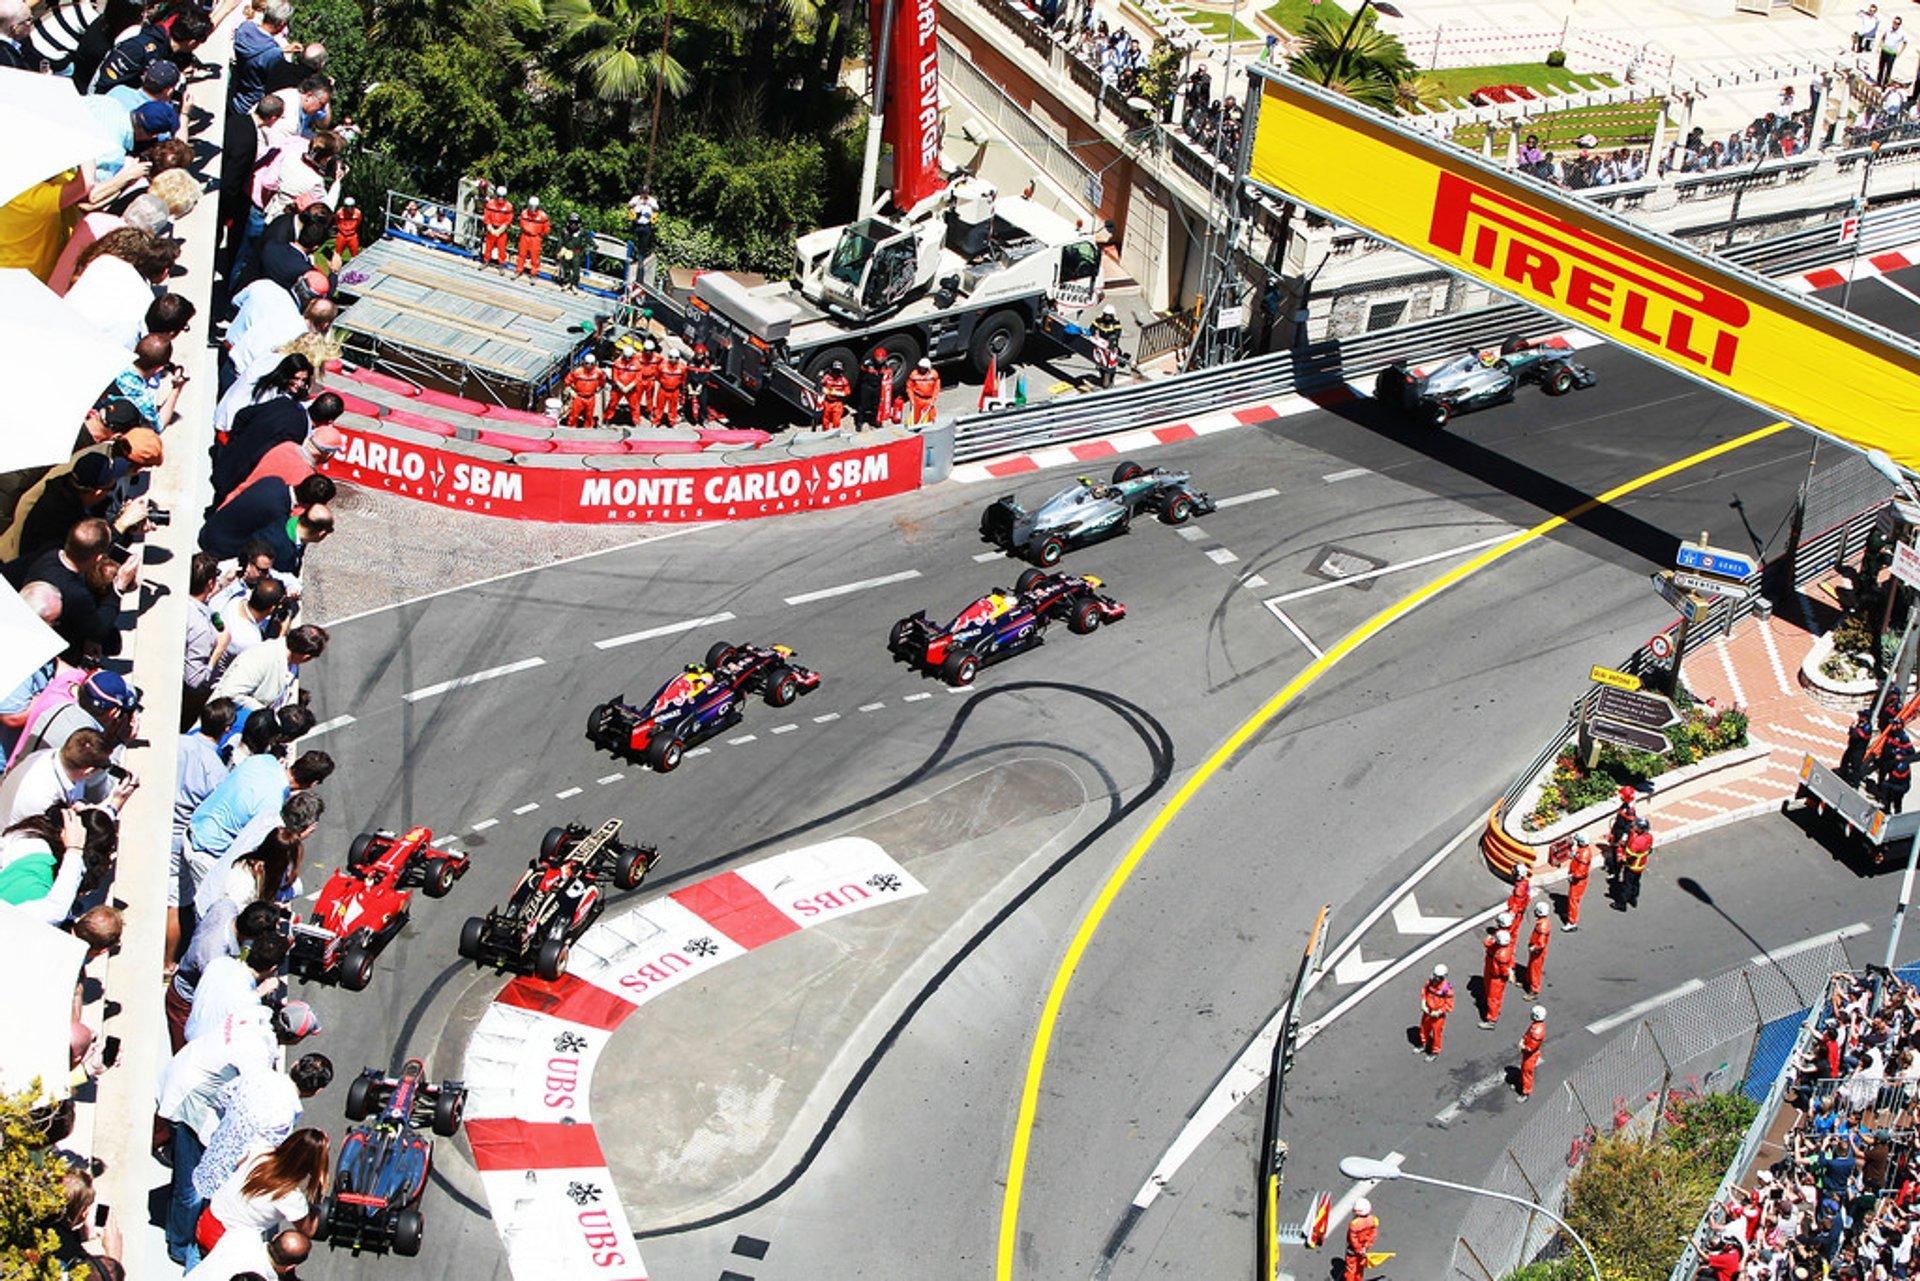 F1 Monaco Grand Prix in Monaco - Best Season 2019